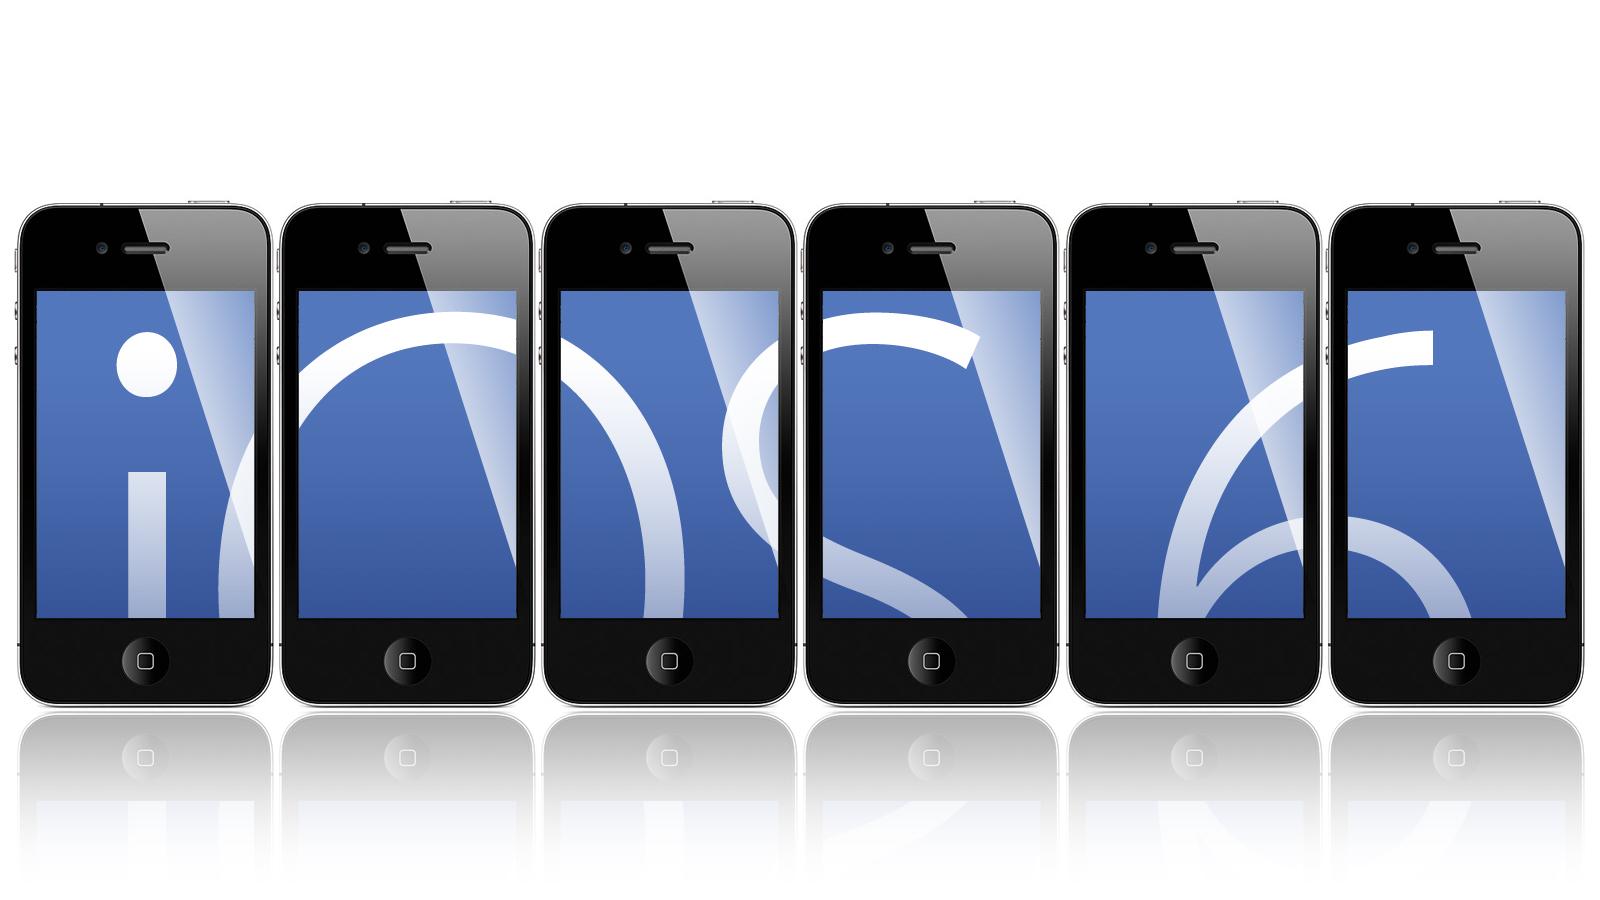 http://1.bp.blogspot.com/-zaWNXeAgAfU/T9nCoREBp-I/AAAAAAAAAGk/vNJefd4-Bz8/s1600/WallInsight-iOS+6.jpg